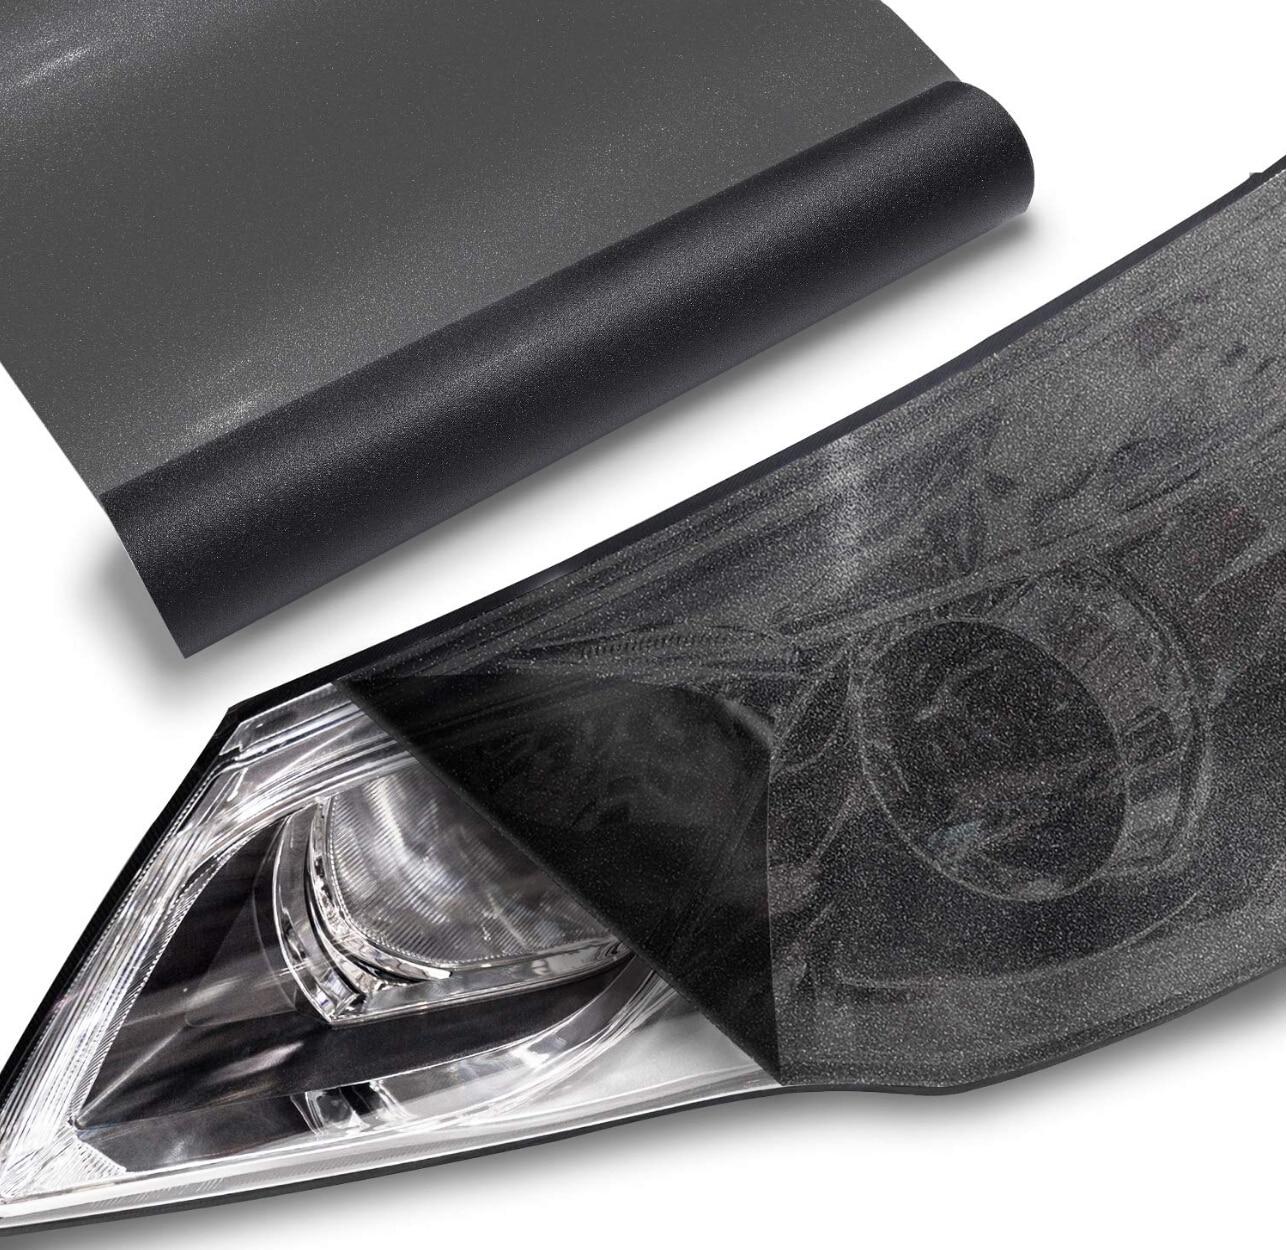 Toyota Hiace Commuter Quantum Gl Spotlight Roof Lamp Tail Lamp Light Cover Trim